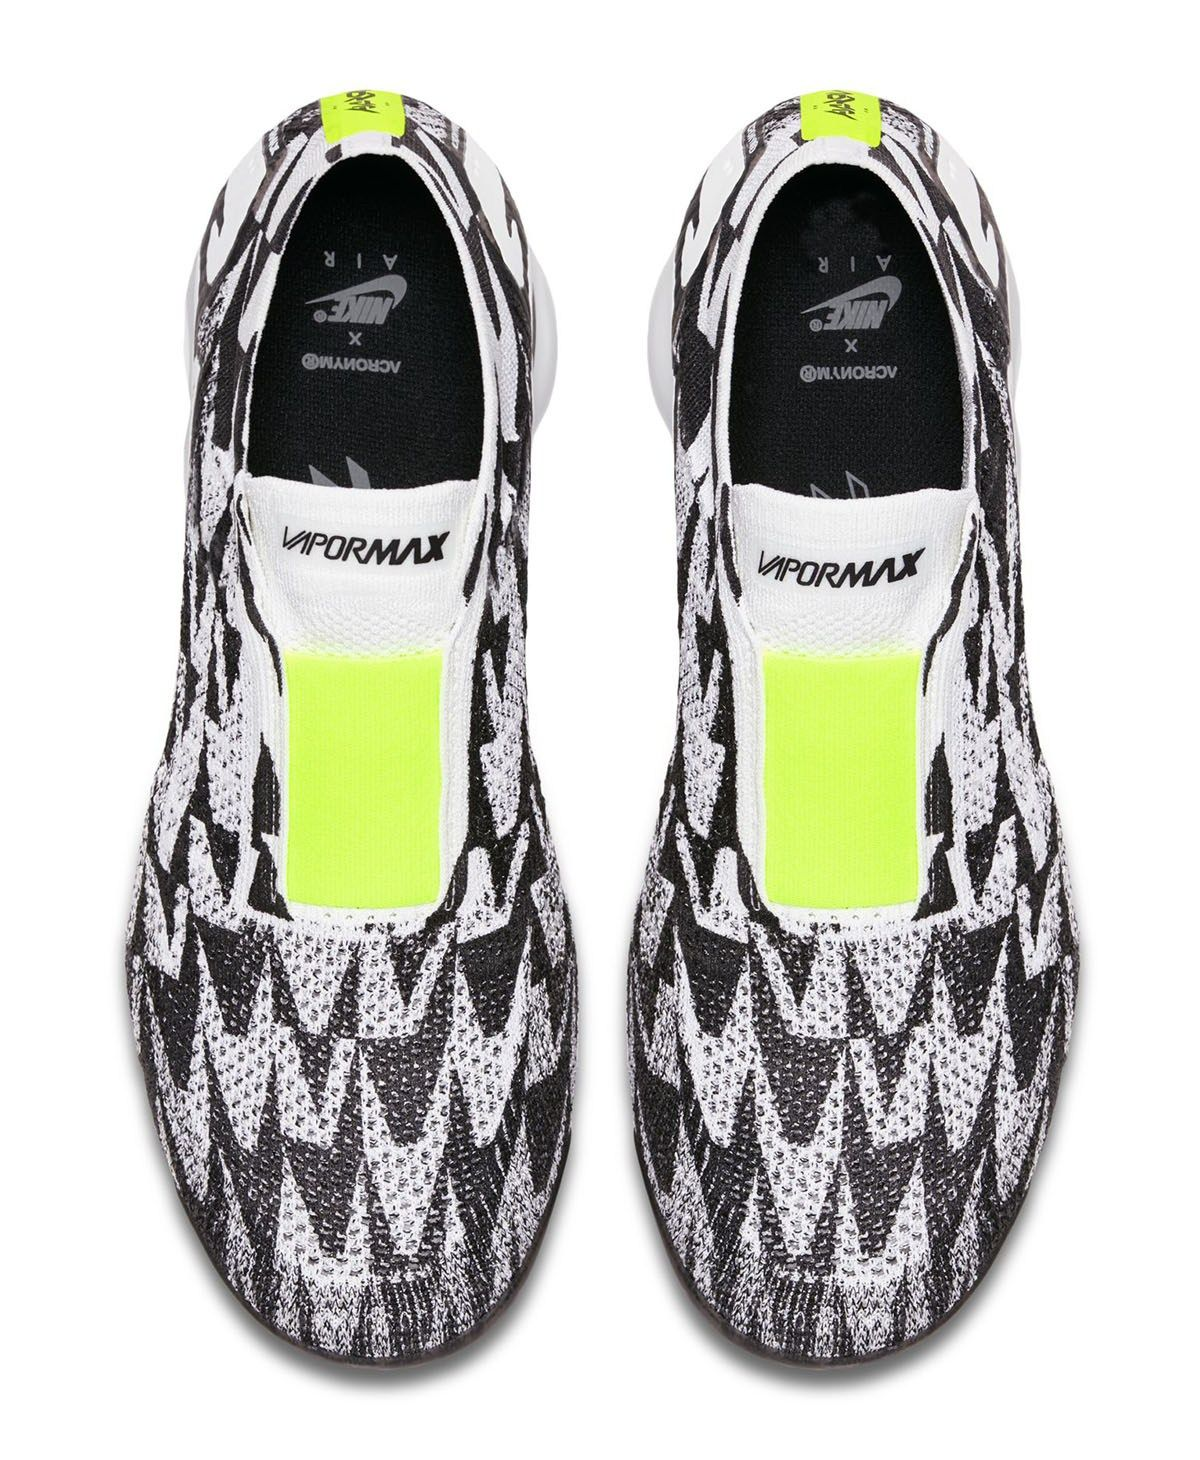 watch 0724f c994a Nike Air VaporMax Flyknit Moc 2 Acronym AMD - EU Kicks  Sneaker Magazine